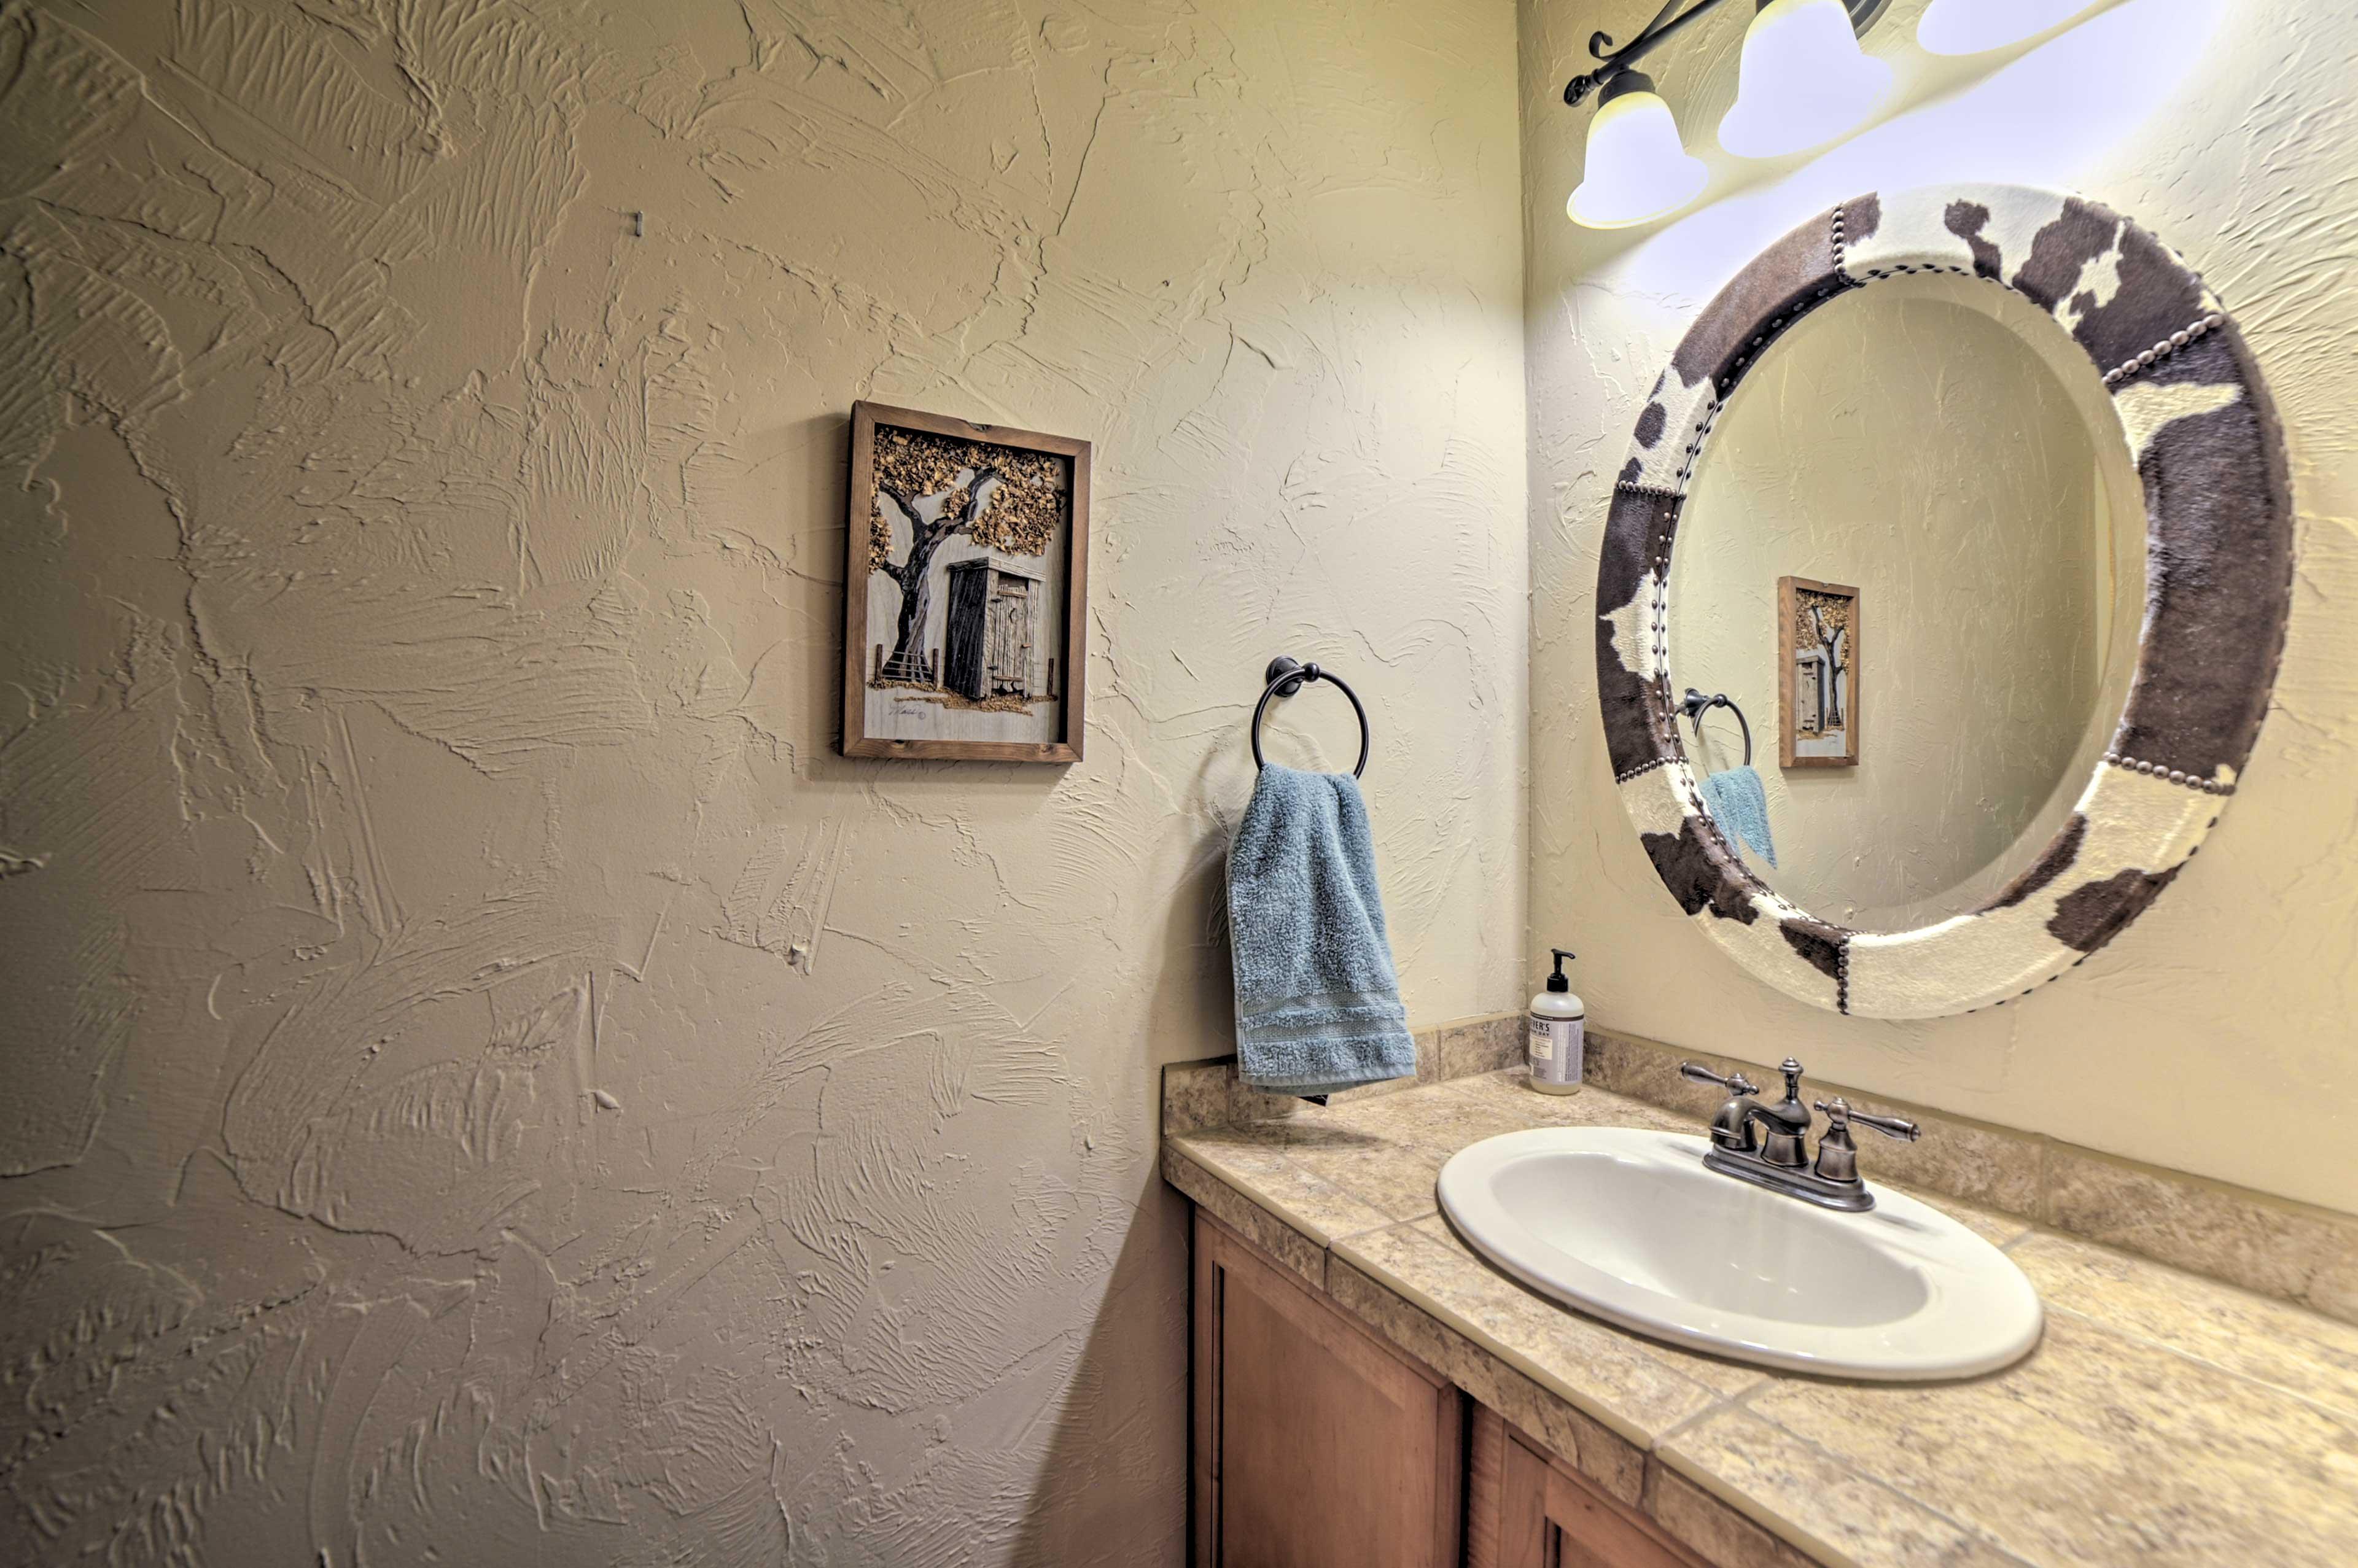 Rinse up in the half bathroom.